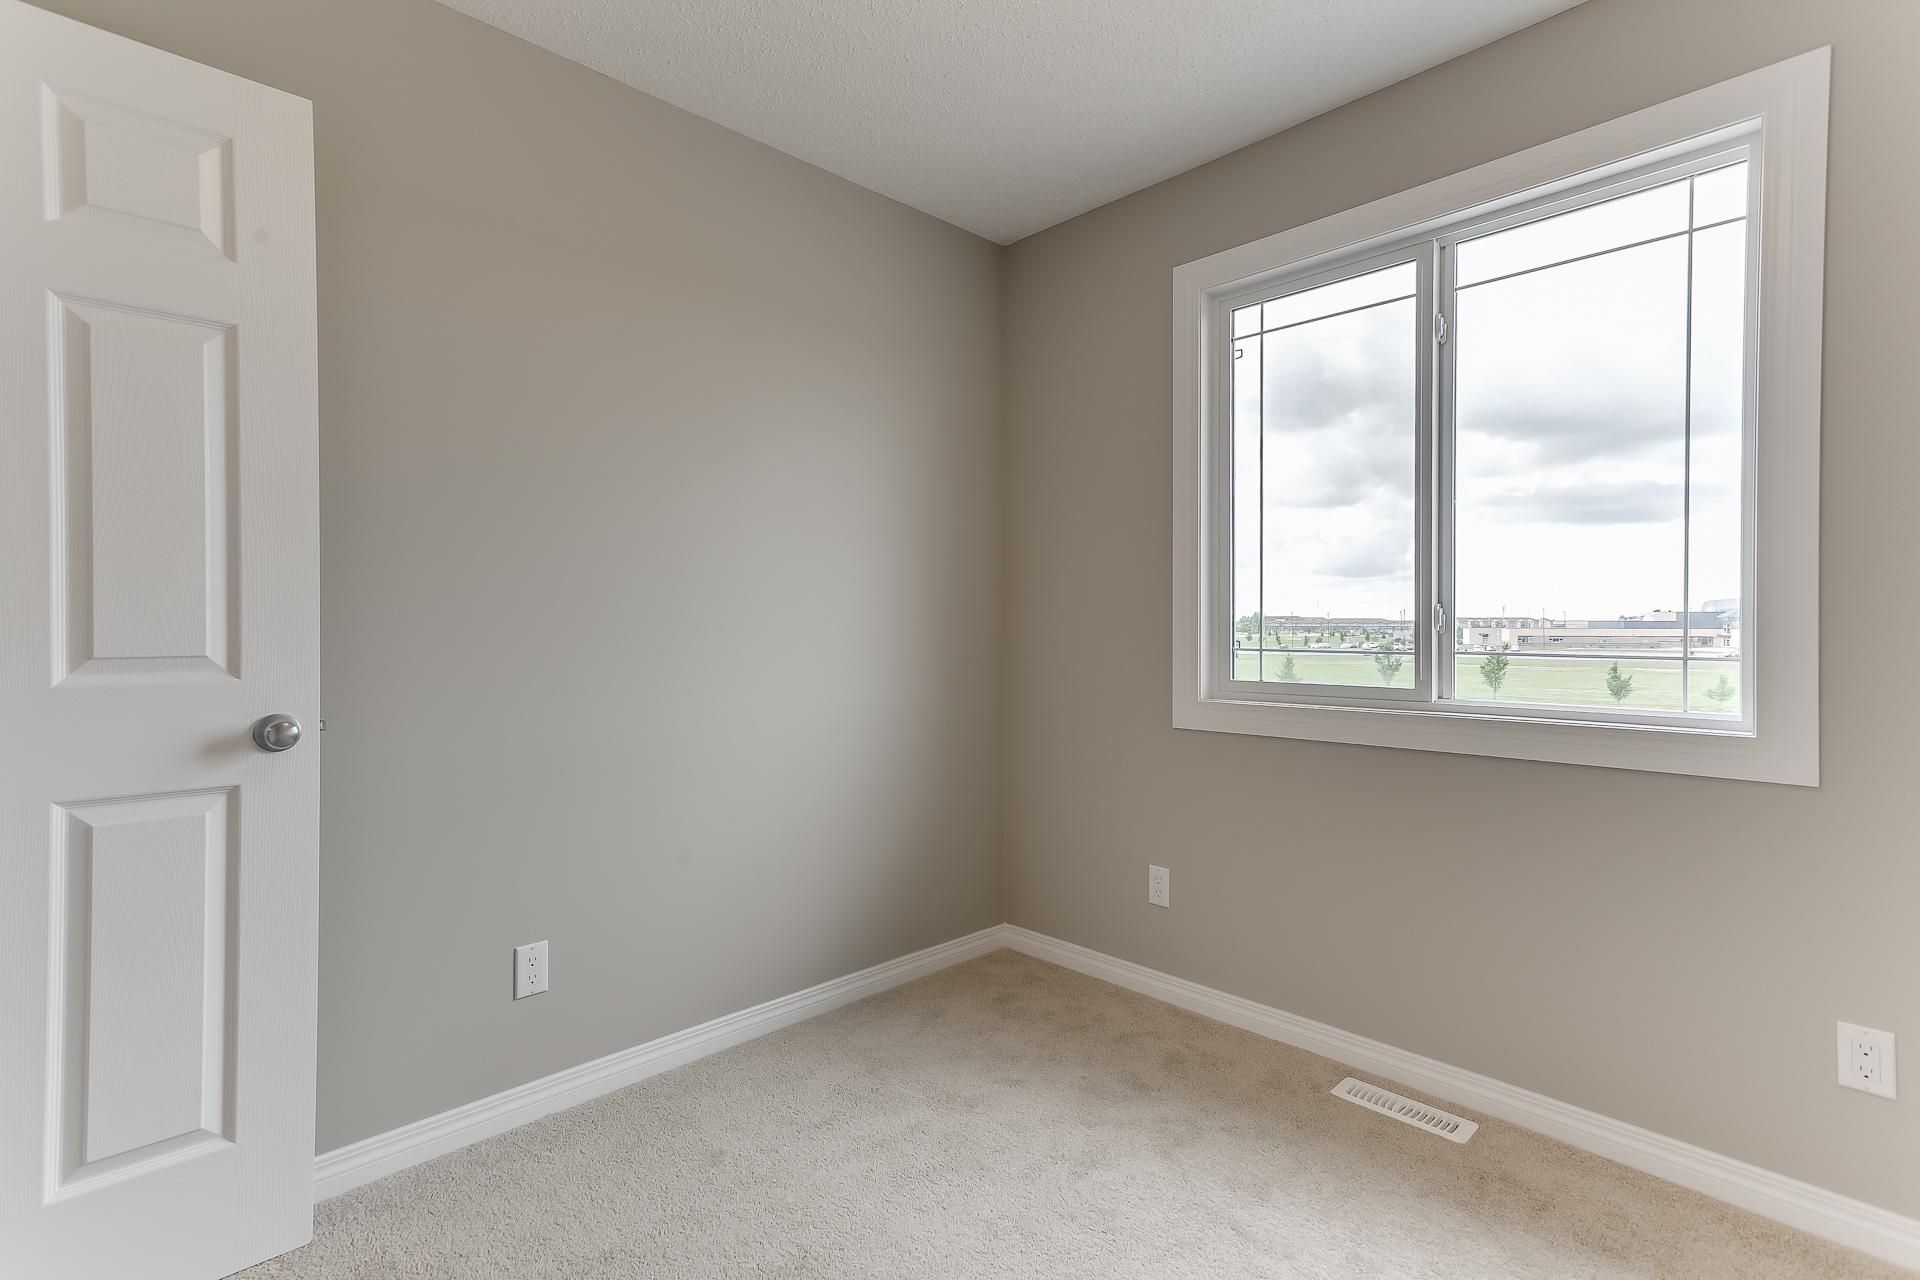 Right Bedroom Window